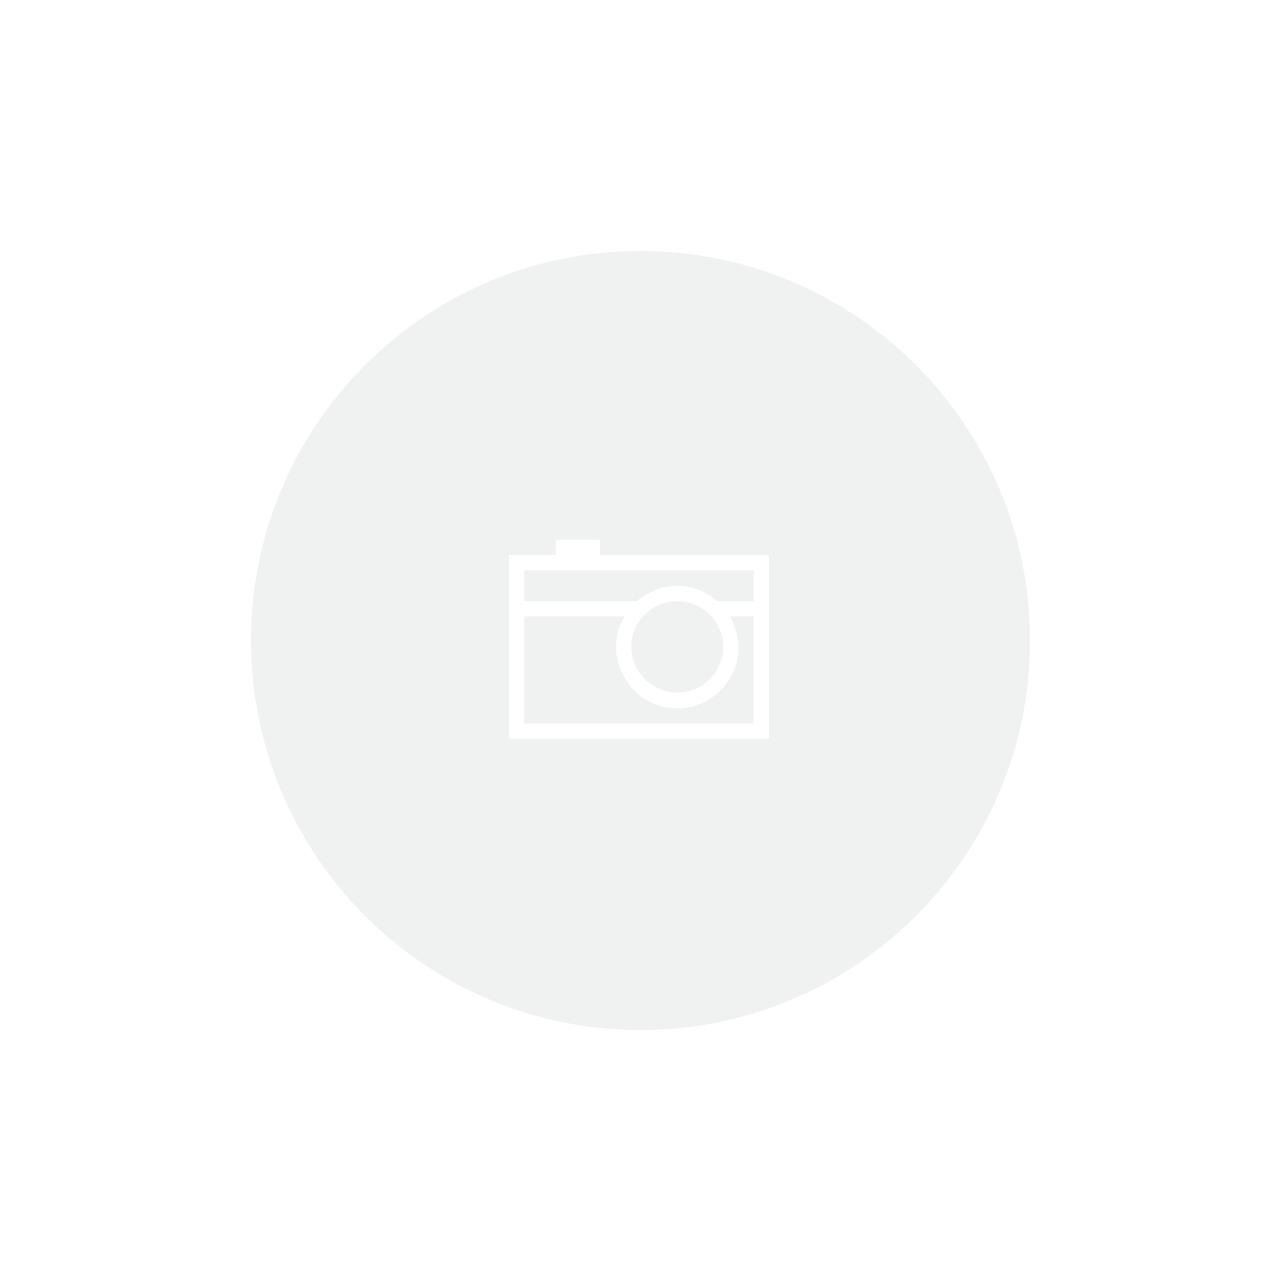 Cadeira De Jantar Charles Eiffel Eames Dsw Base Madeira